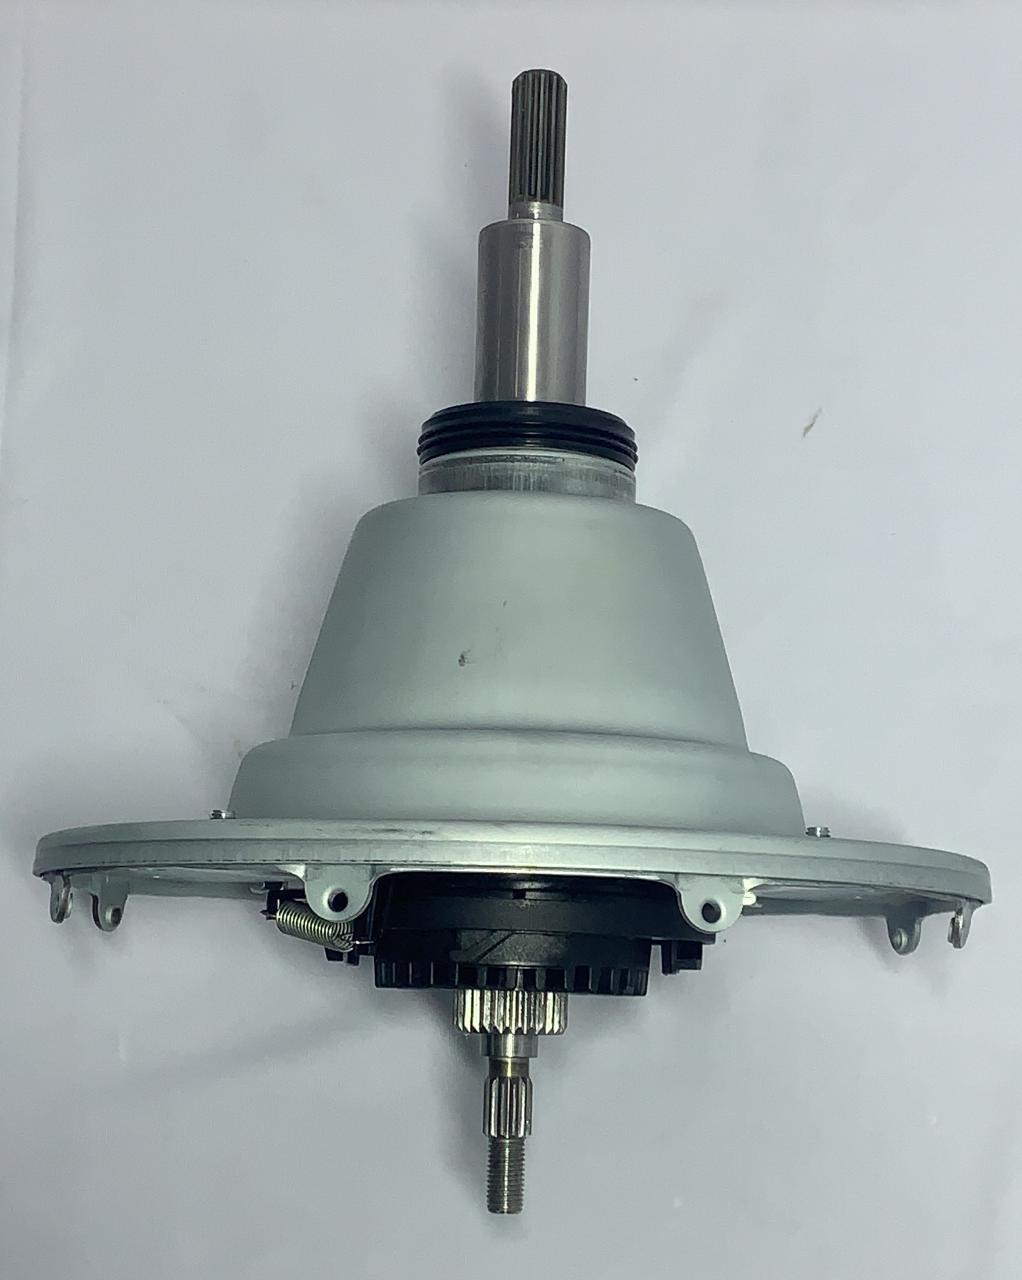 Transmissão Electrolux Ltr15 Lvb15 Lst12 Lta15 Lbu15 - Alado